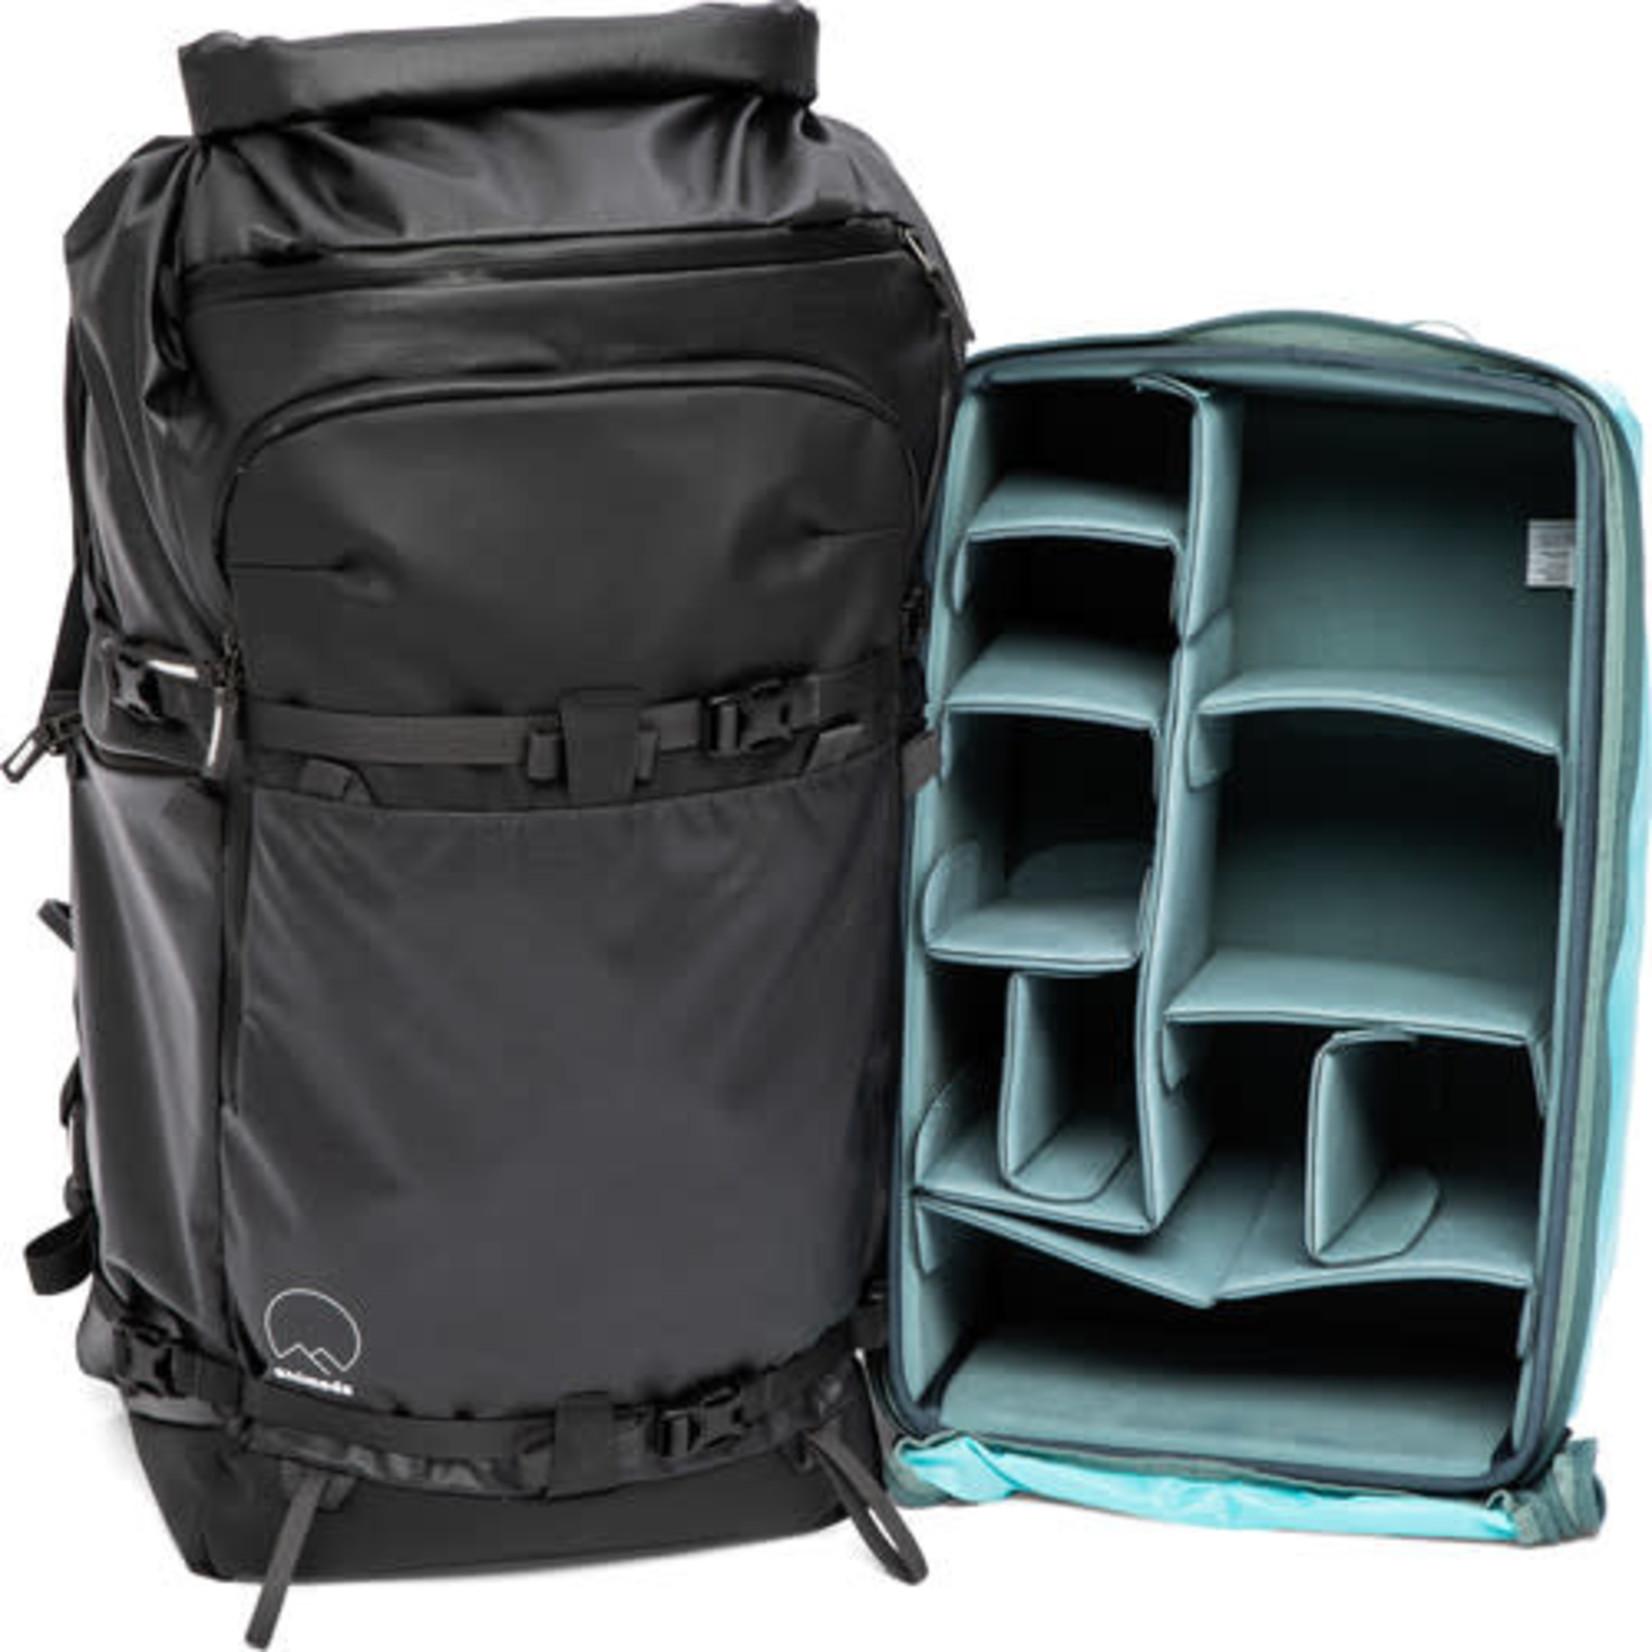 Shimoda Shimoda Designs Action X70 Backpack Starter Kit with X-Large DV Core Unit (Bla